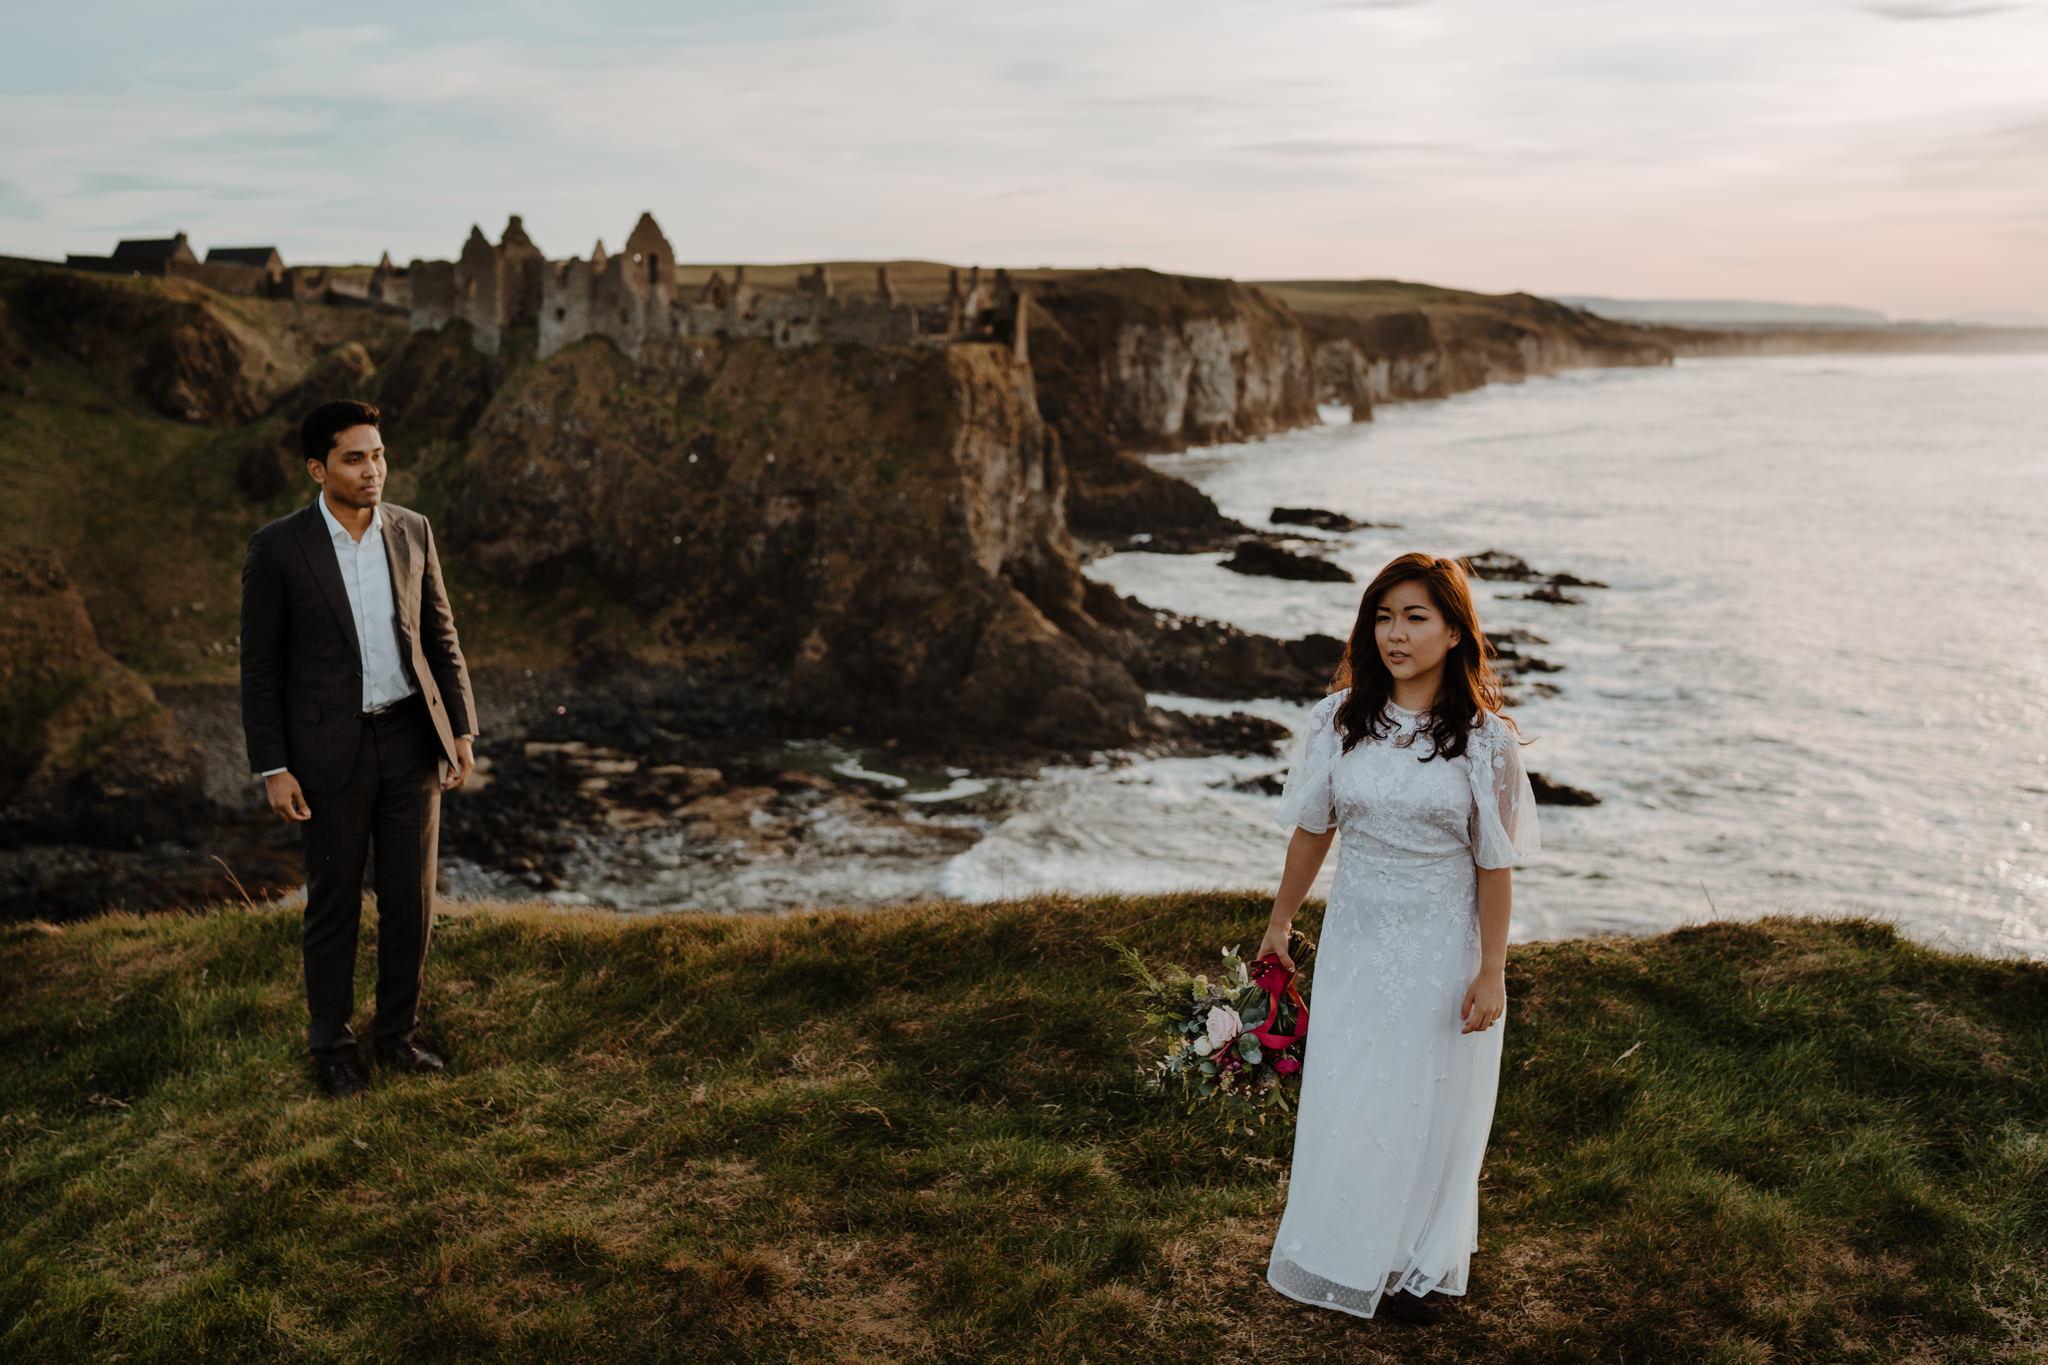 dunluce-castle-elopement-northern-ireland-irish-elopement